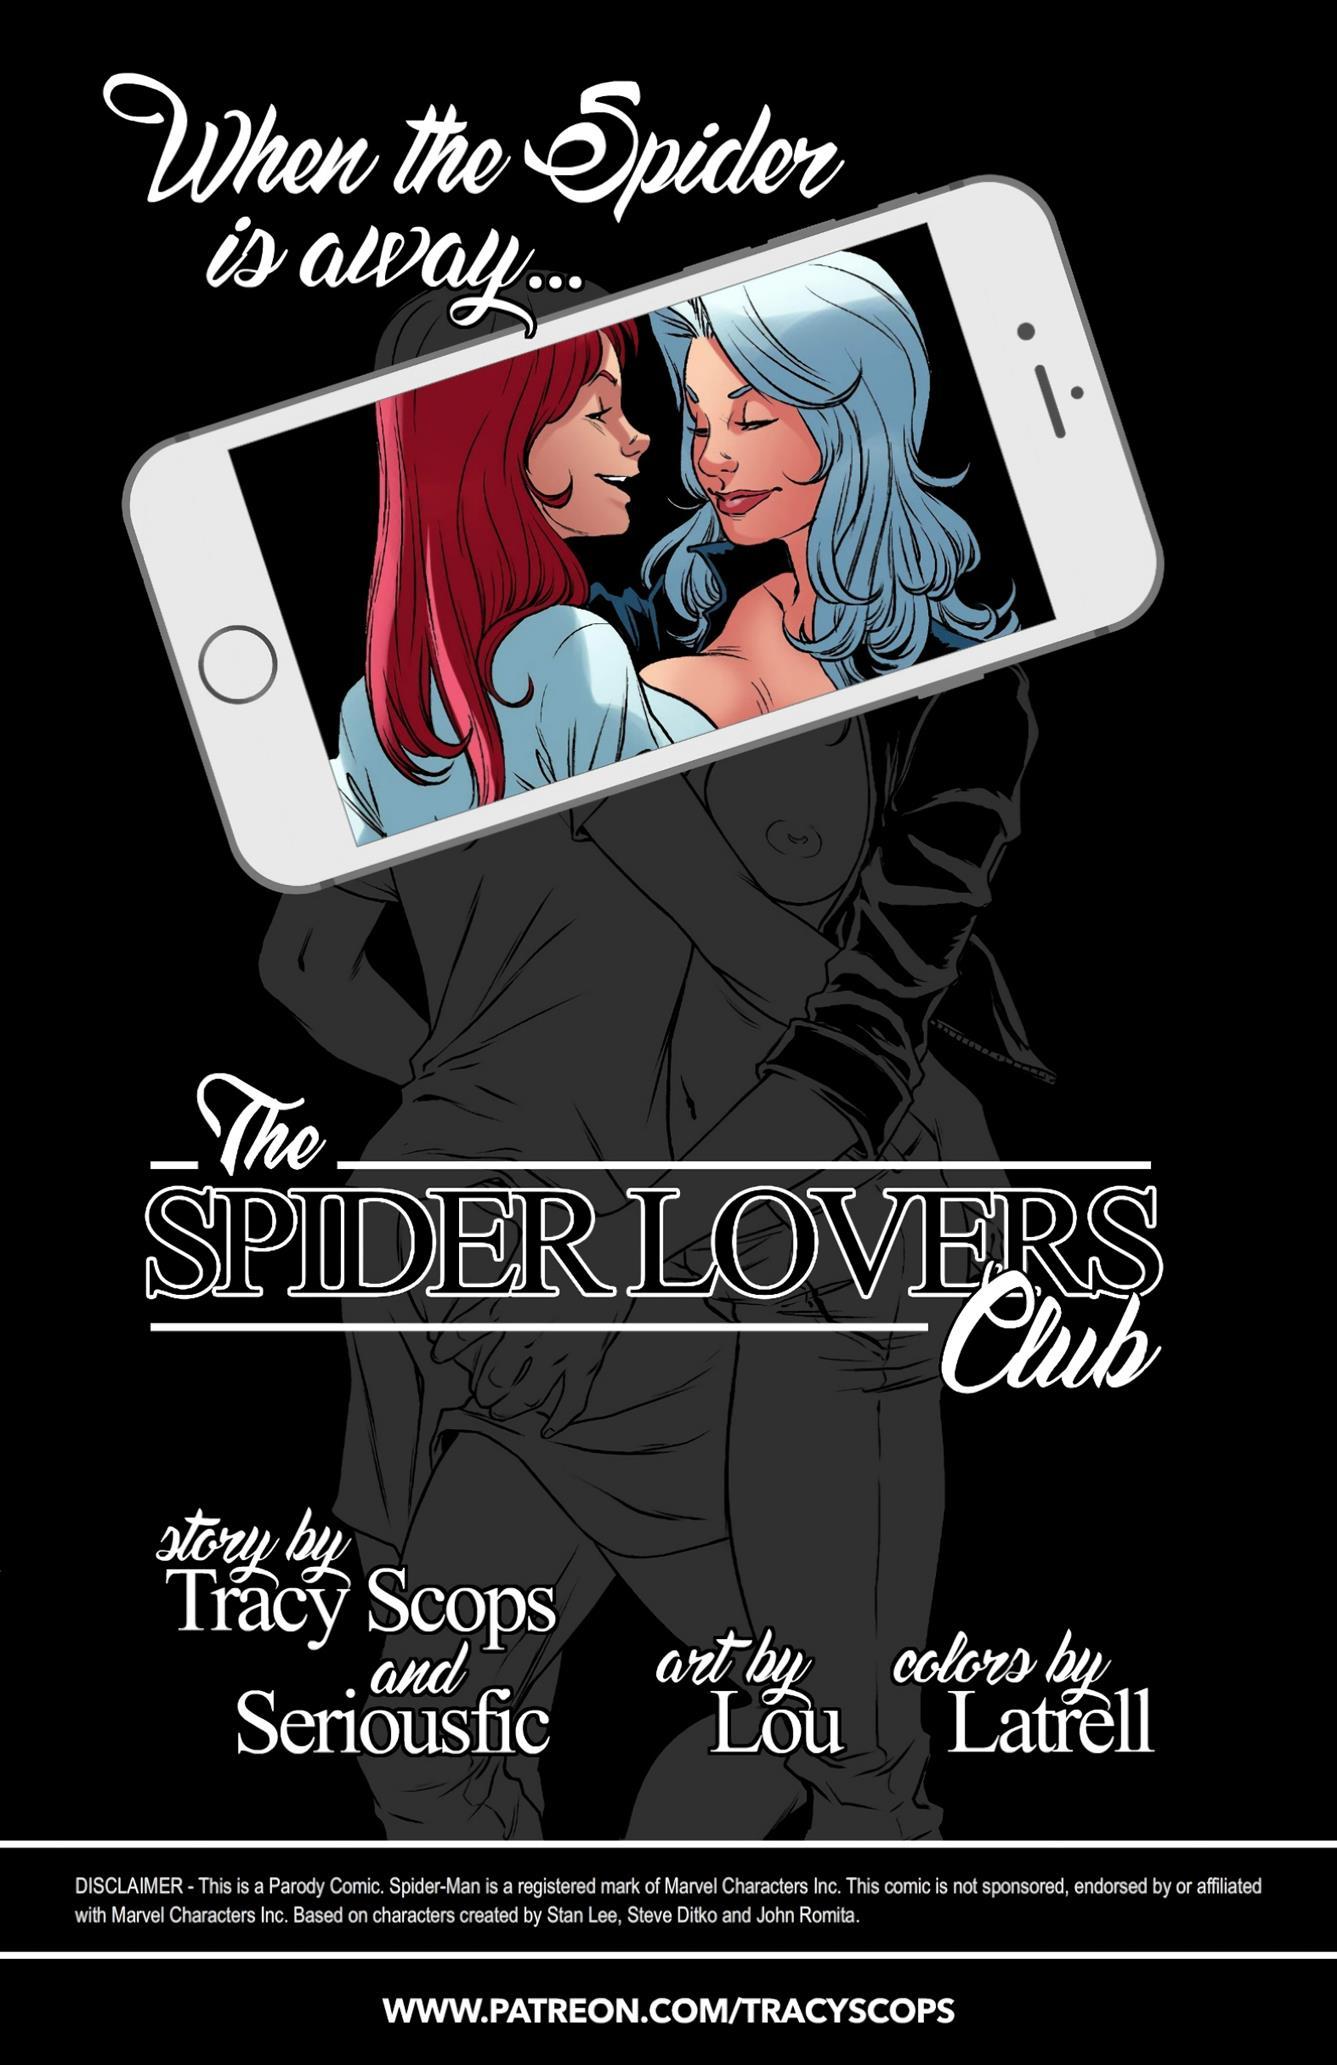 SPIDER LOVERS CLUB (Spider-man) [TracyScops]